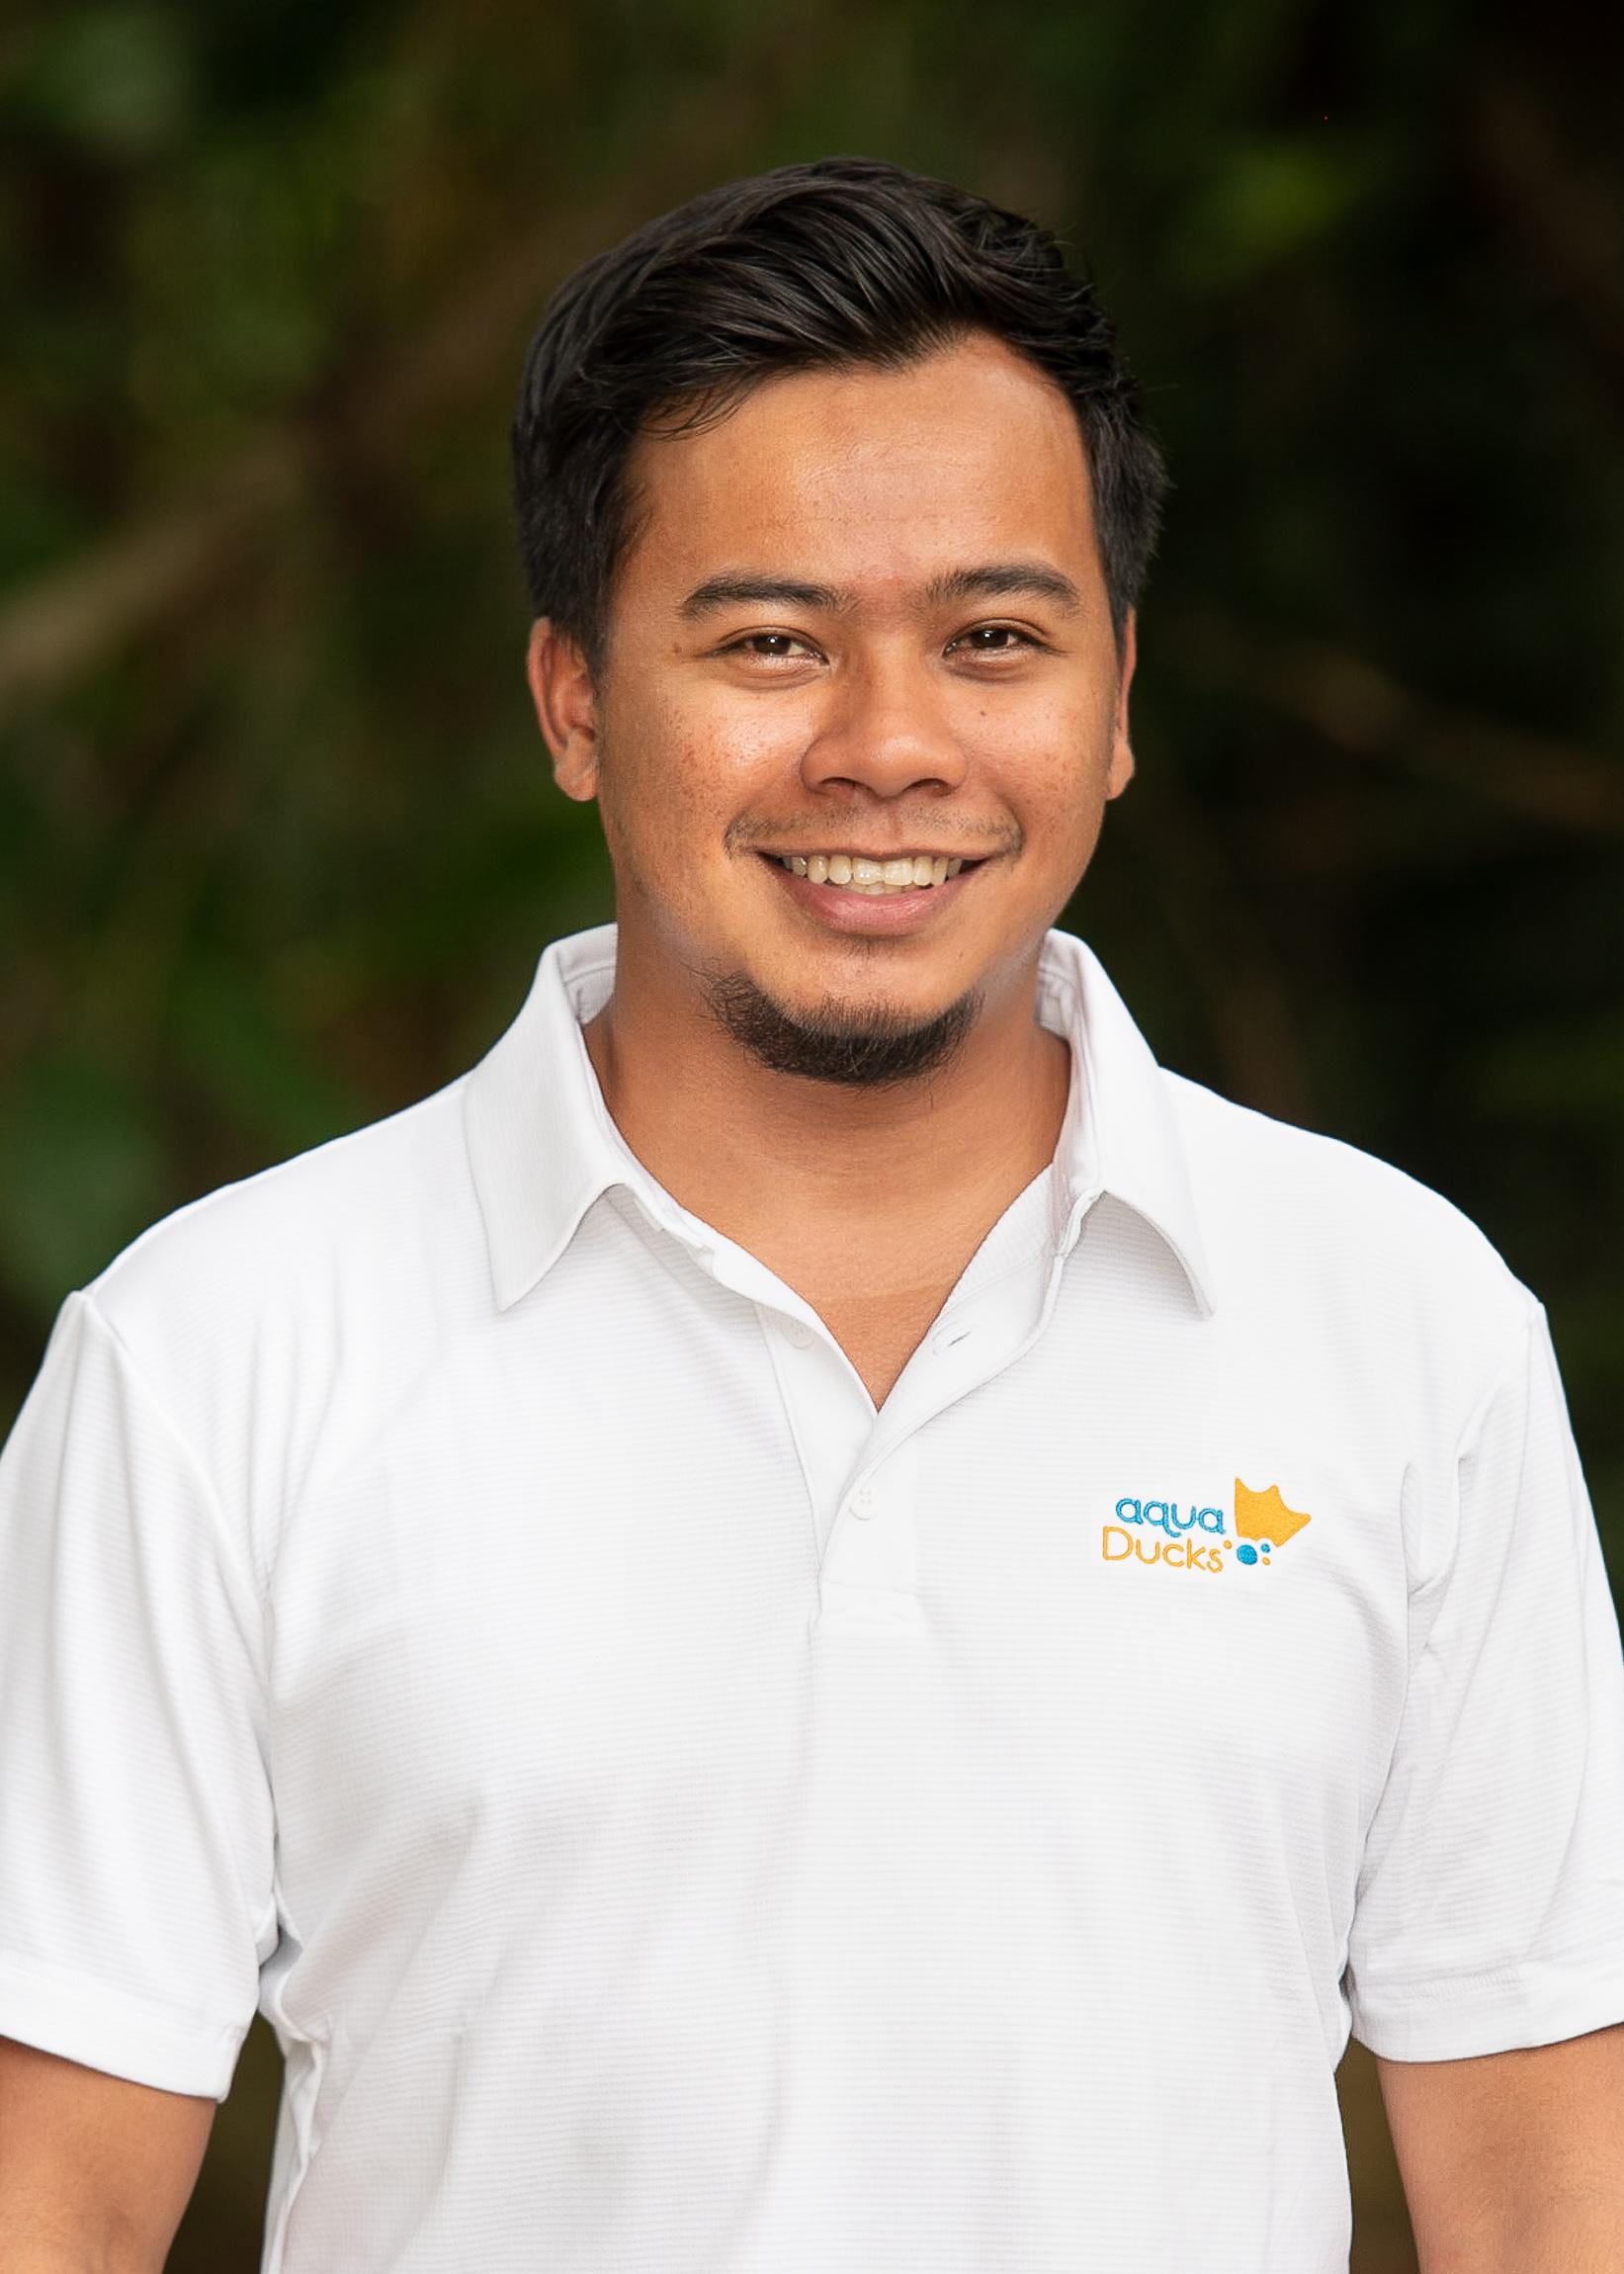 aquaDucks | Our Team - Syazani (Tom)